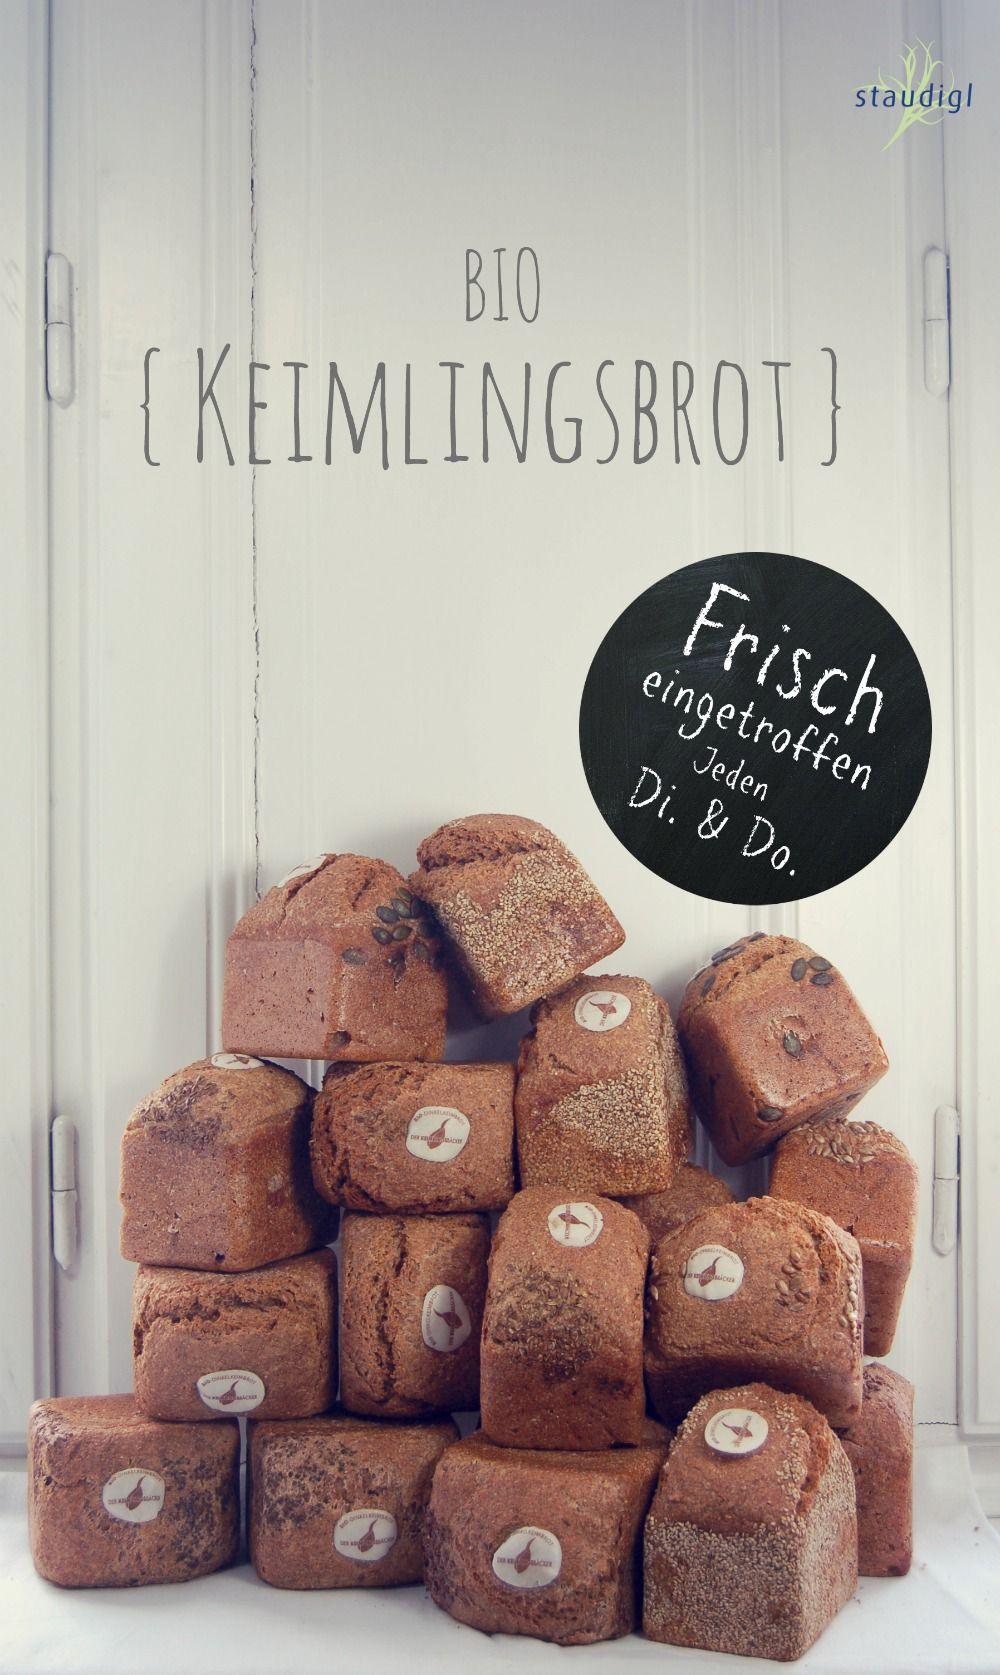 Pin von Staudigl Wien auf Reformhaus Staudigl | Food ...